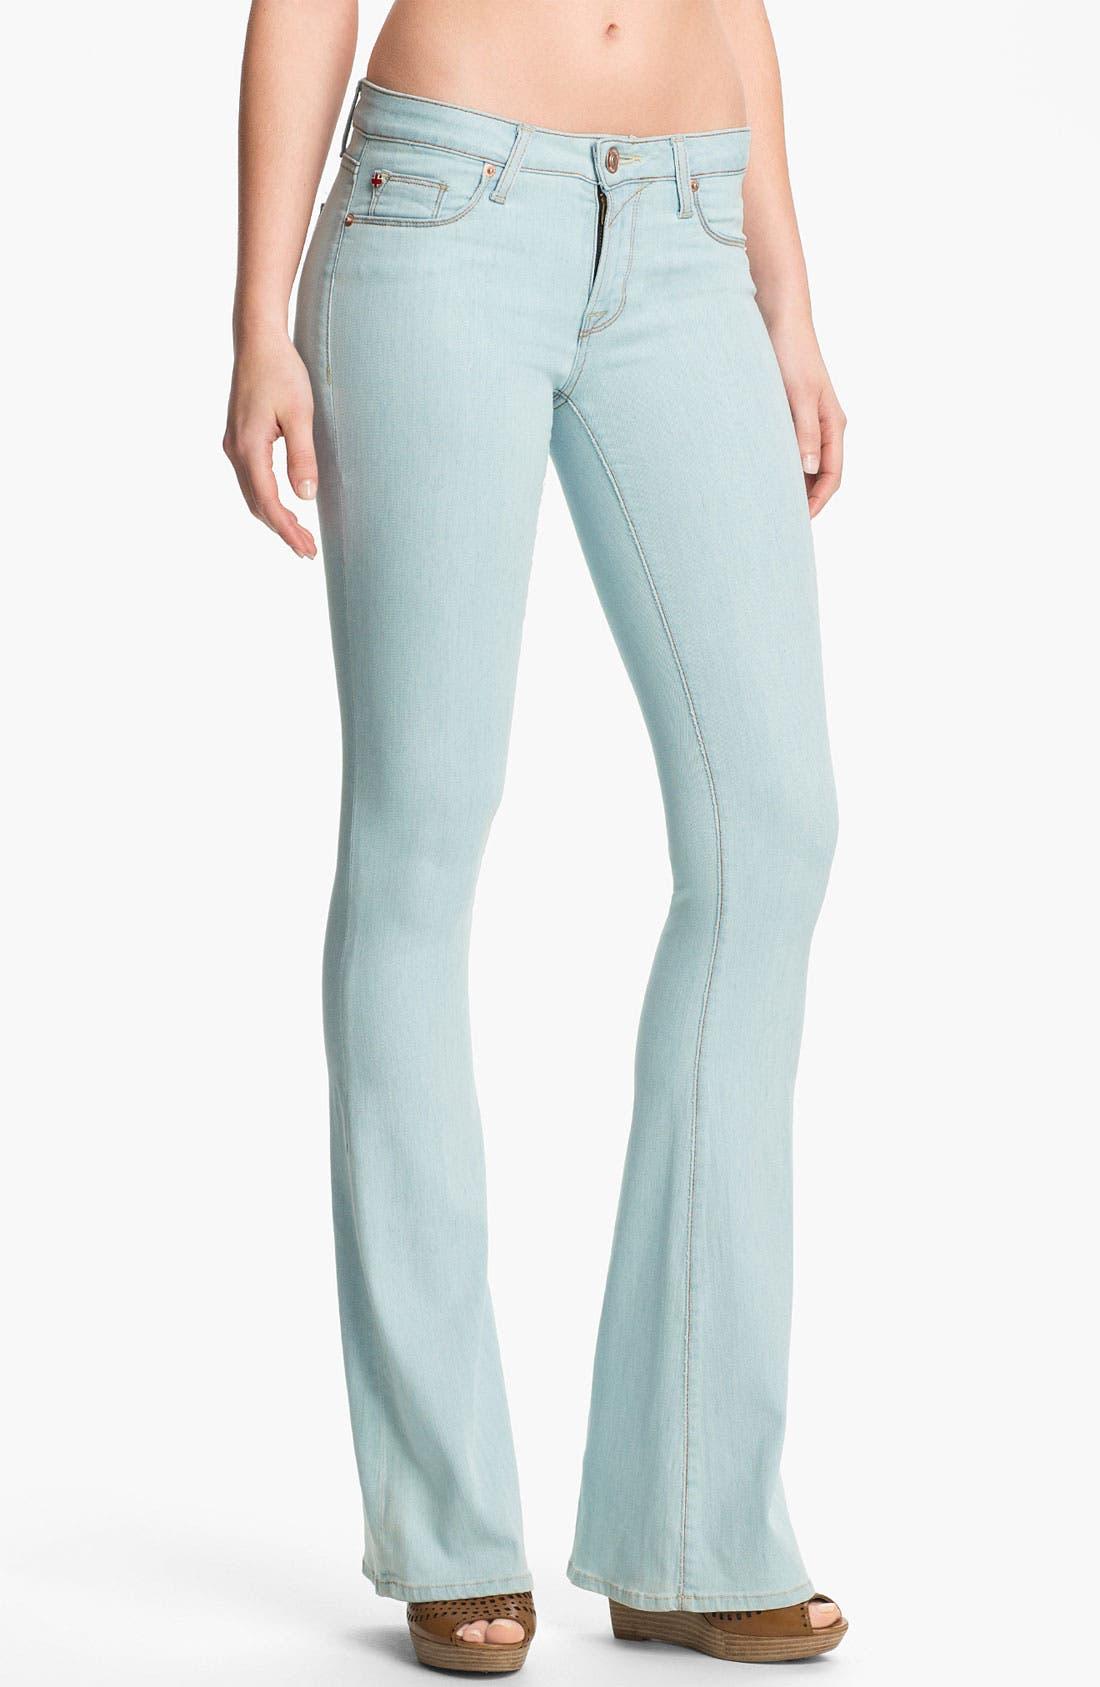 Alternate Image 1 Selected - Hudson Jeans Flare Leg Jeans (Dahlia)